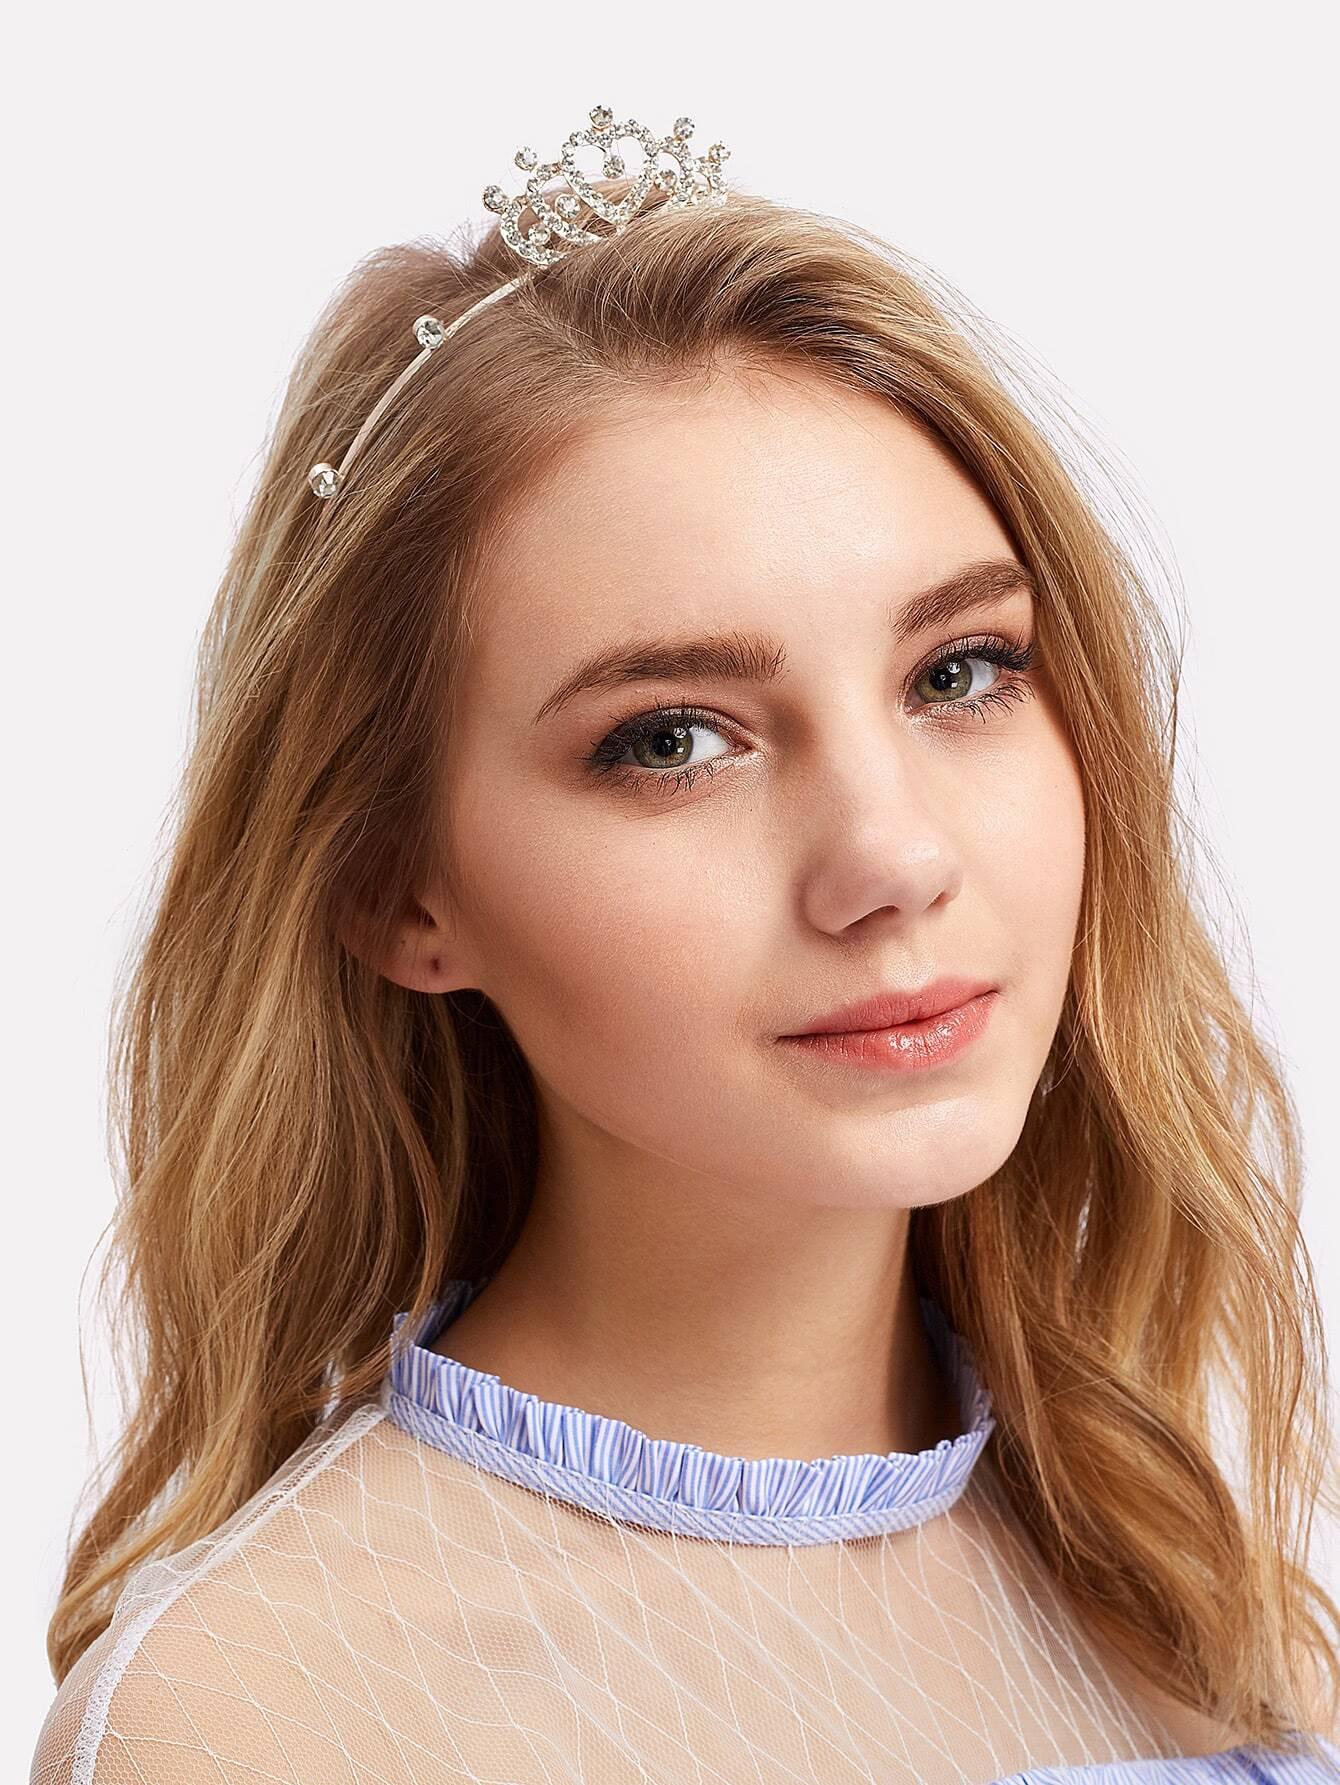 Rhinestone Crown Decorated Headband